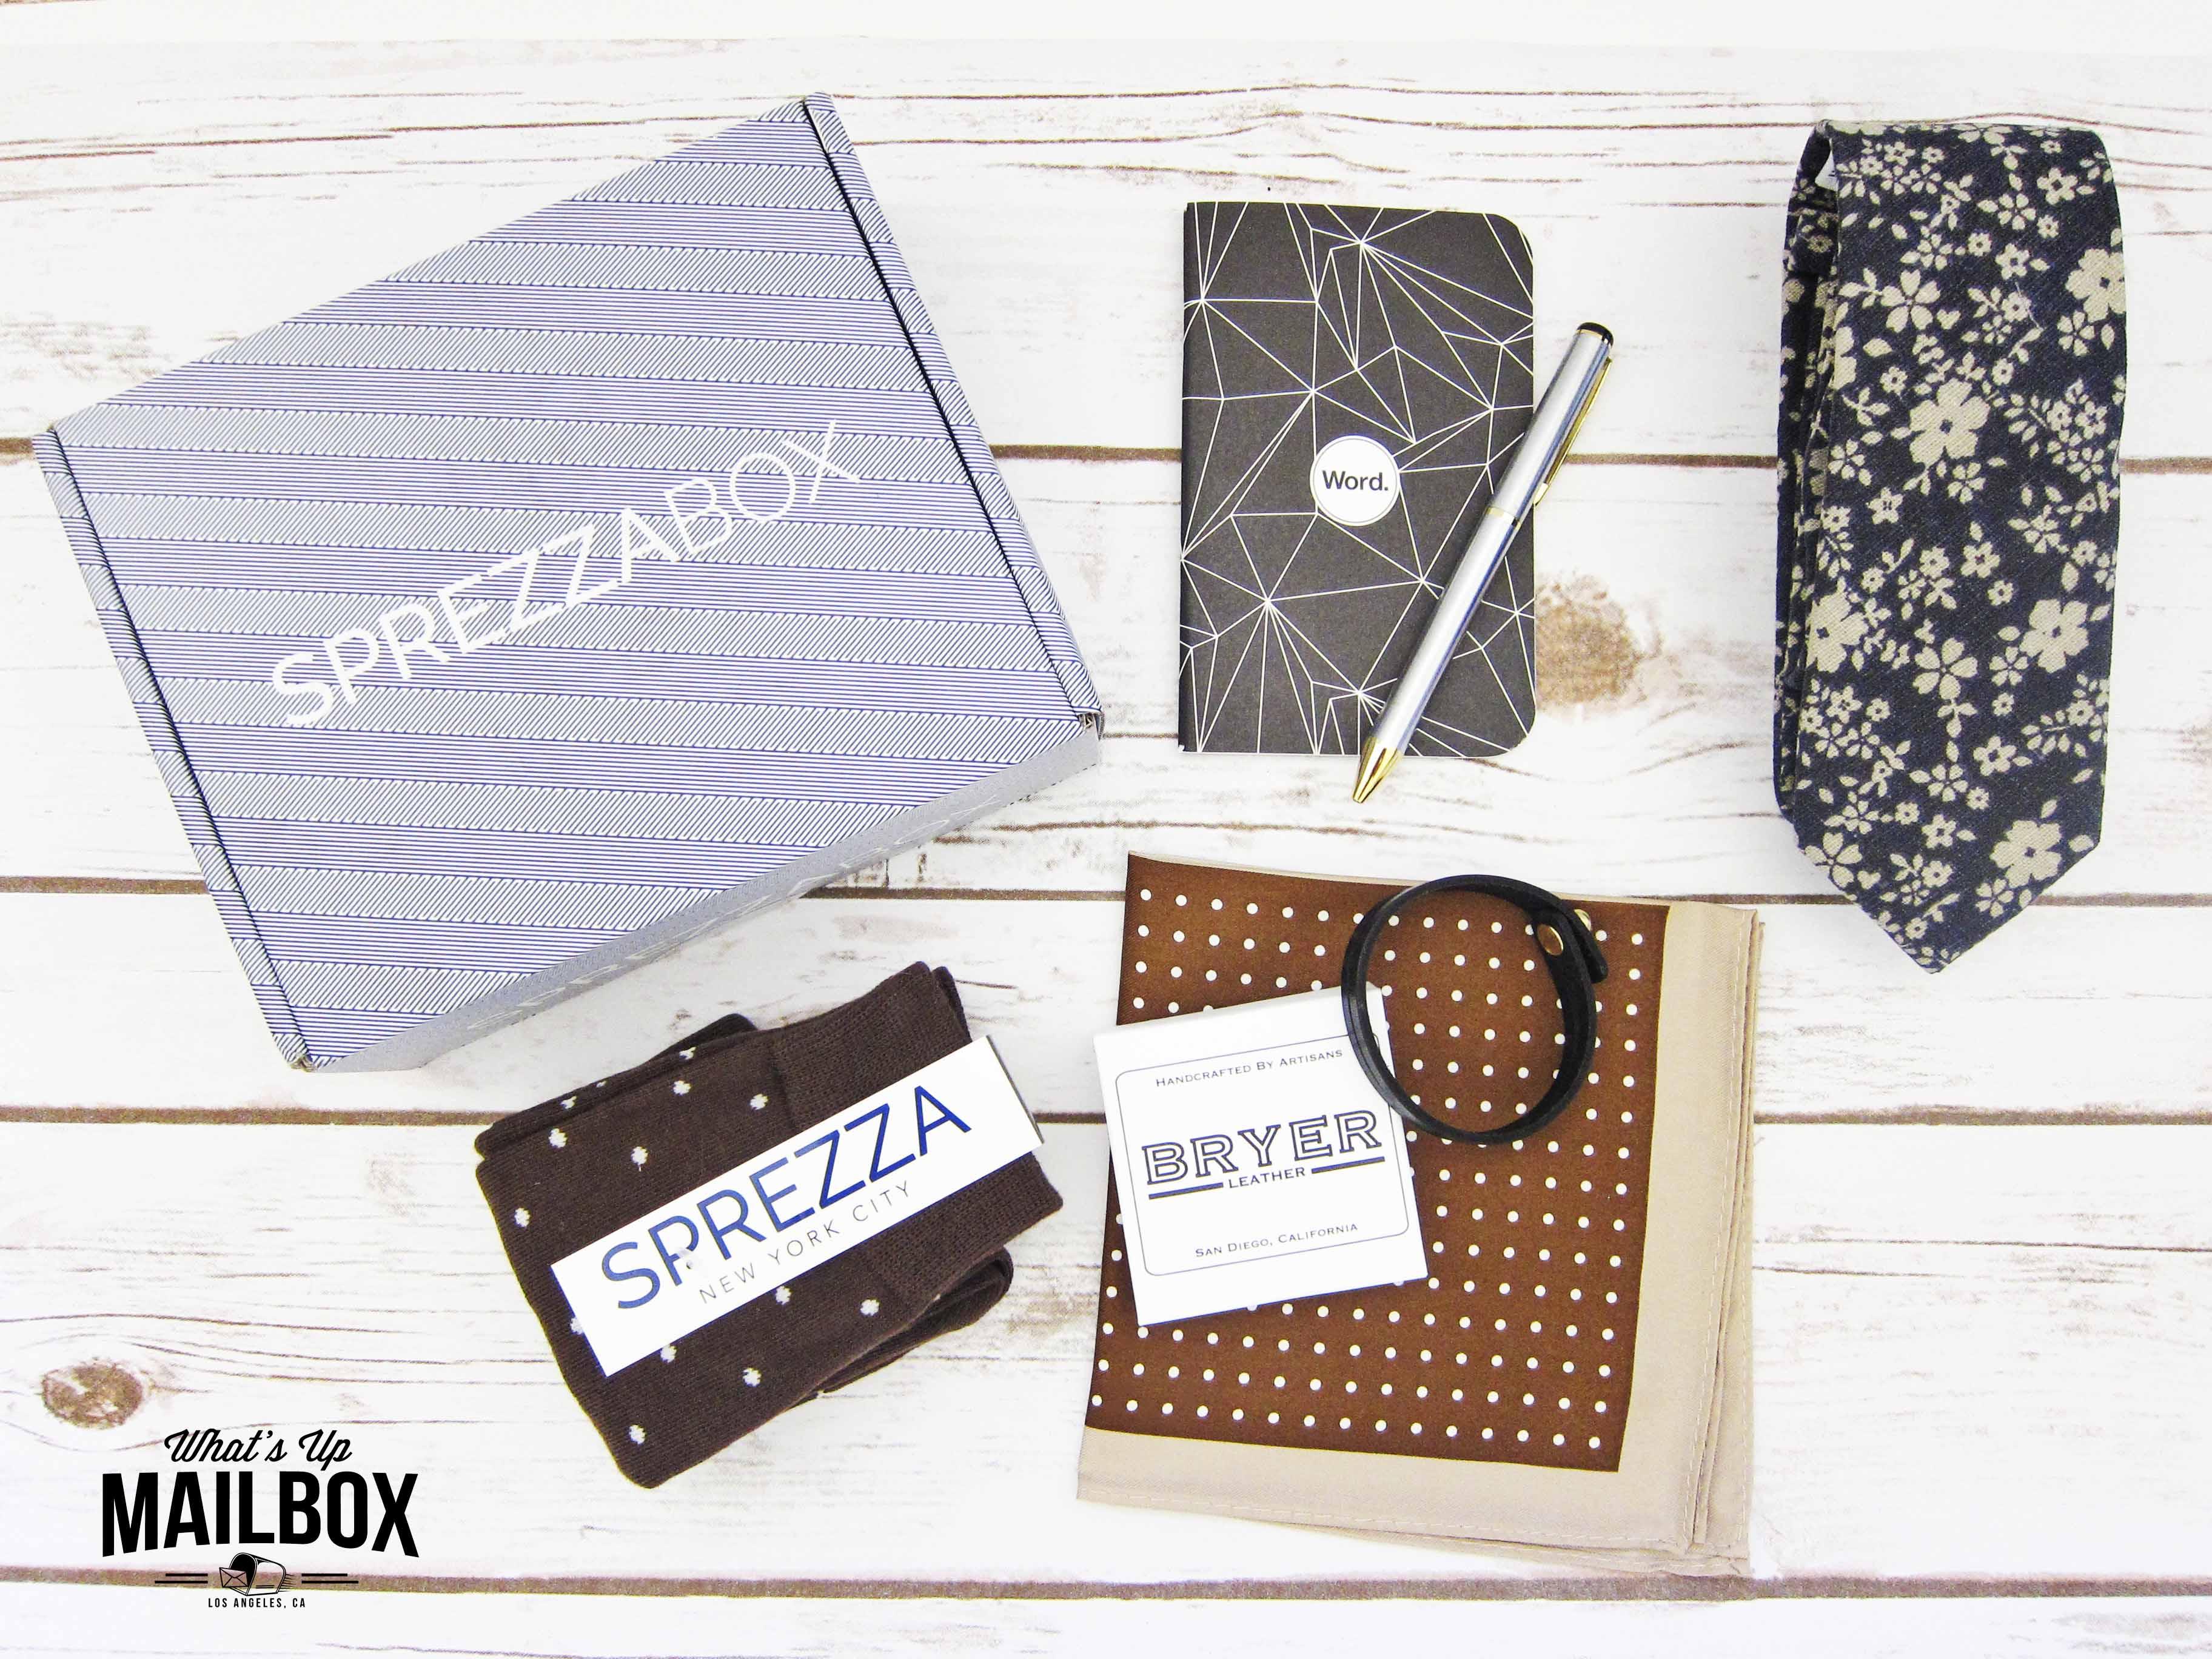 Sprezza Box July 2016 Review + Coupon!